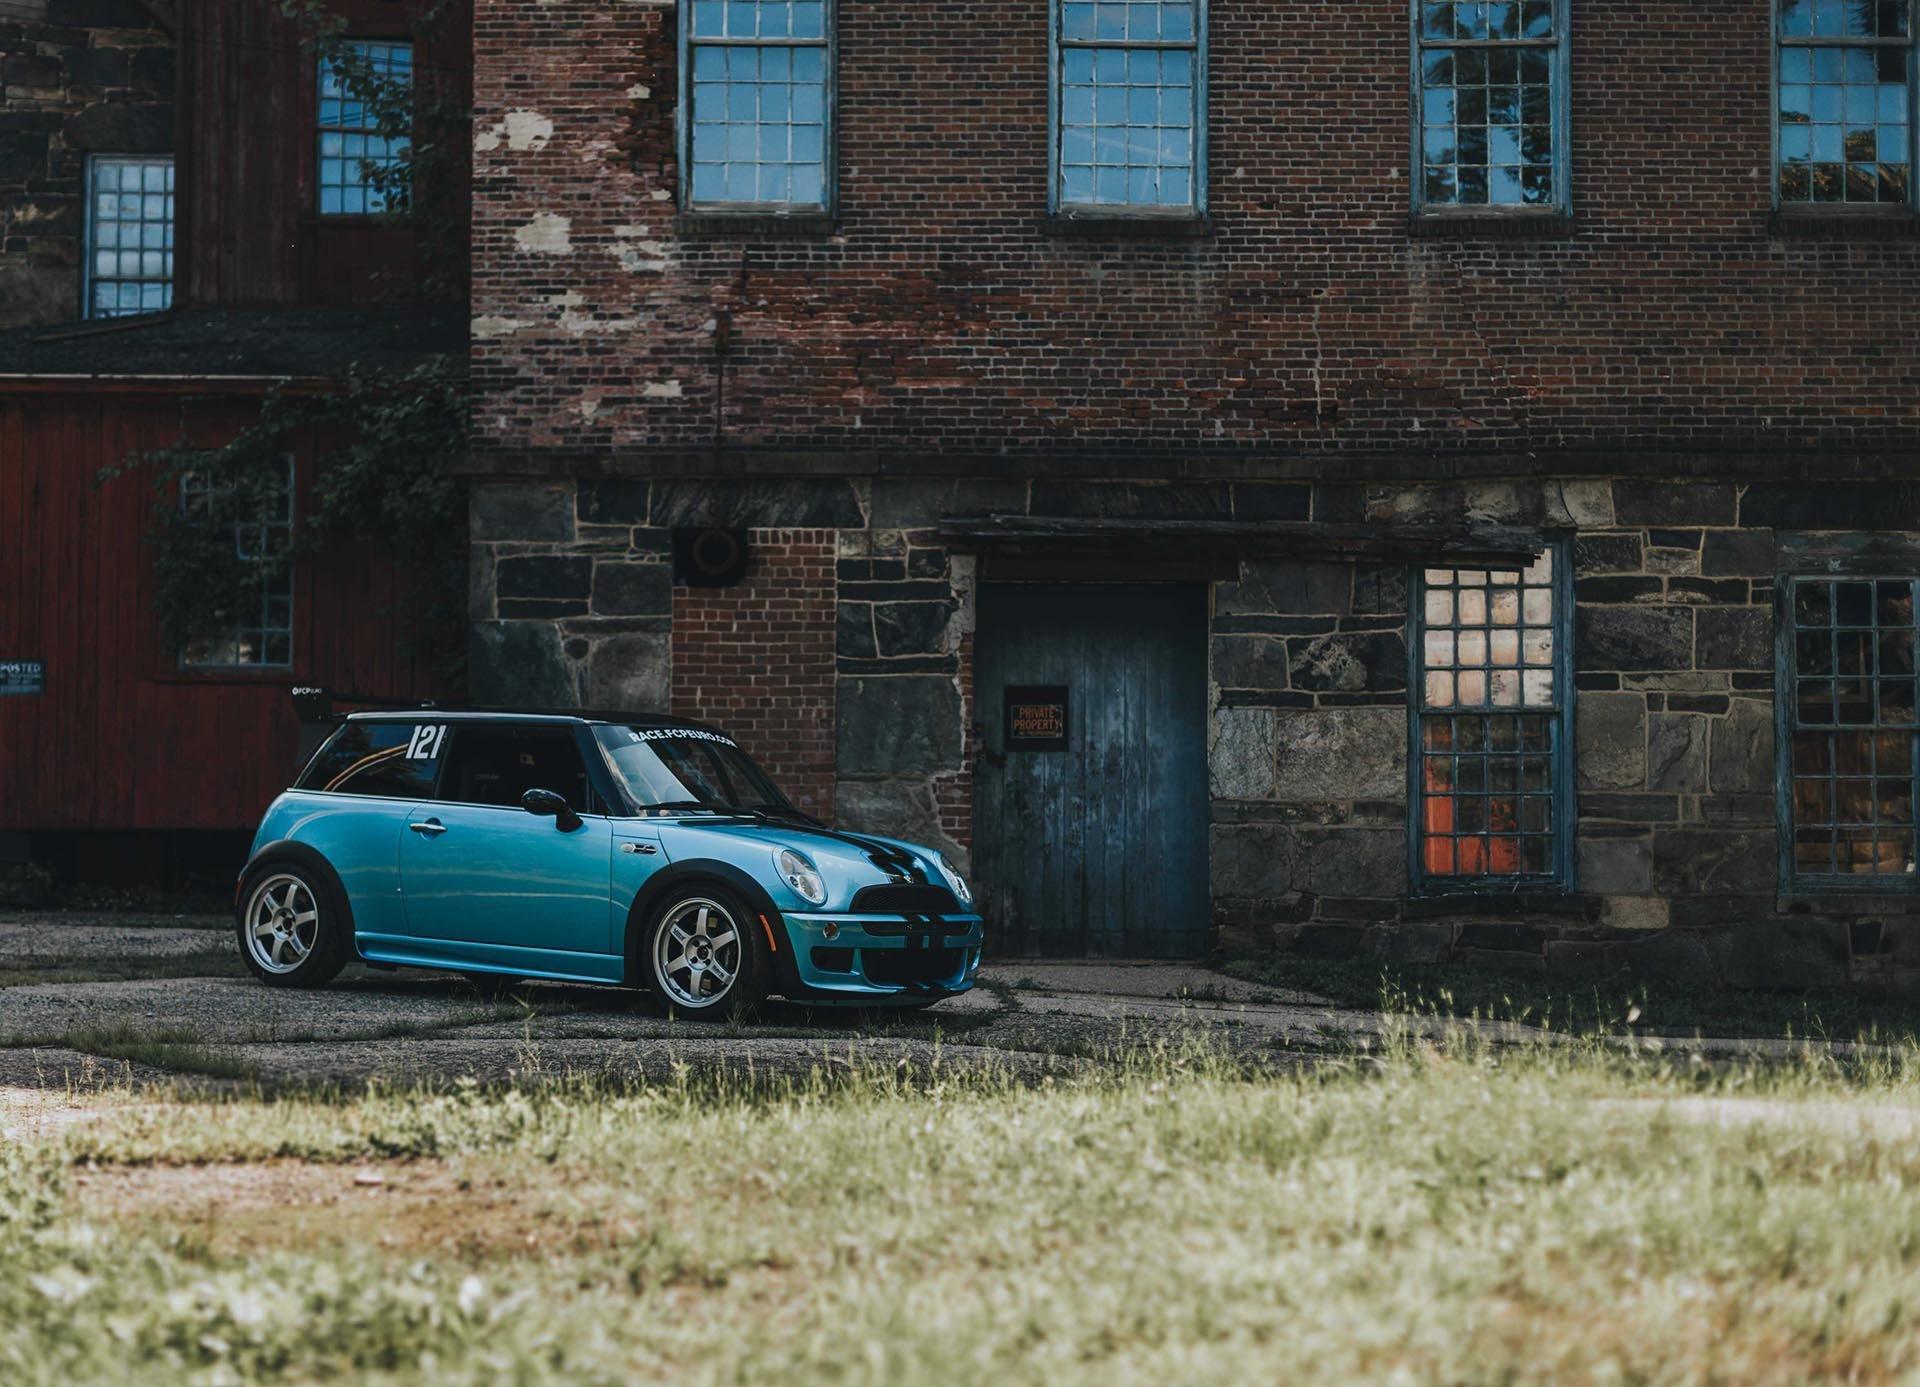 05_MINI Cooper S R52 Electric Blue front